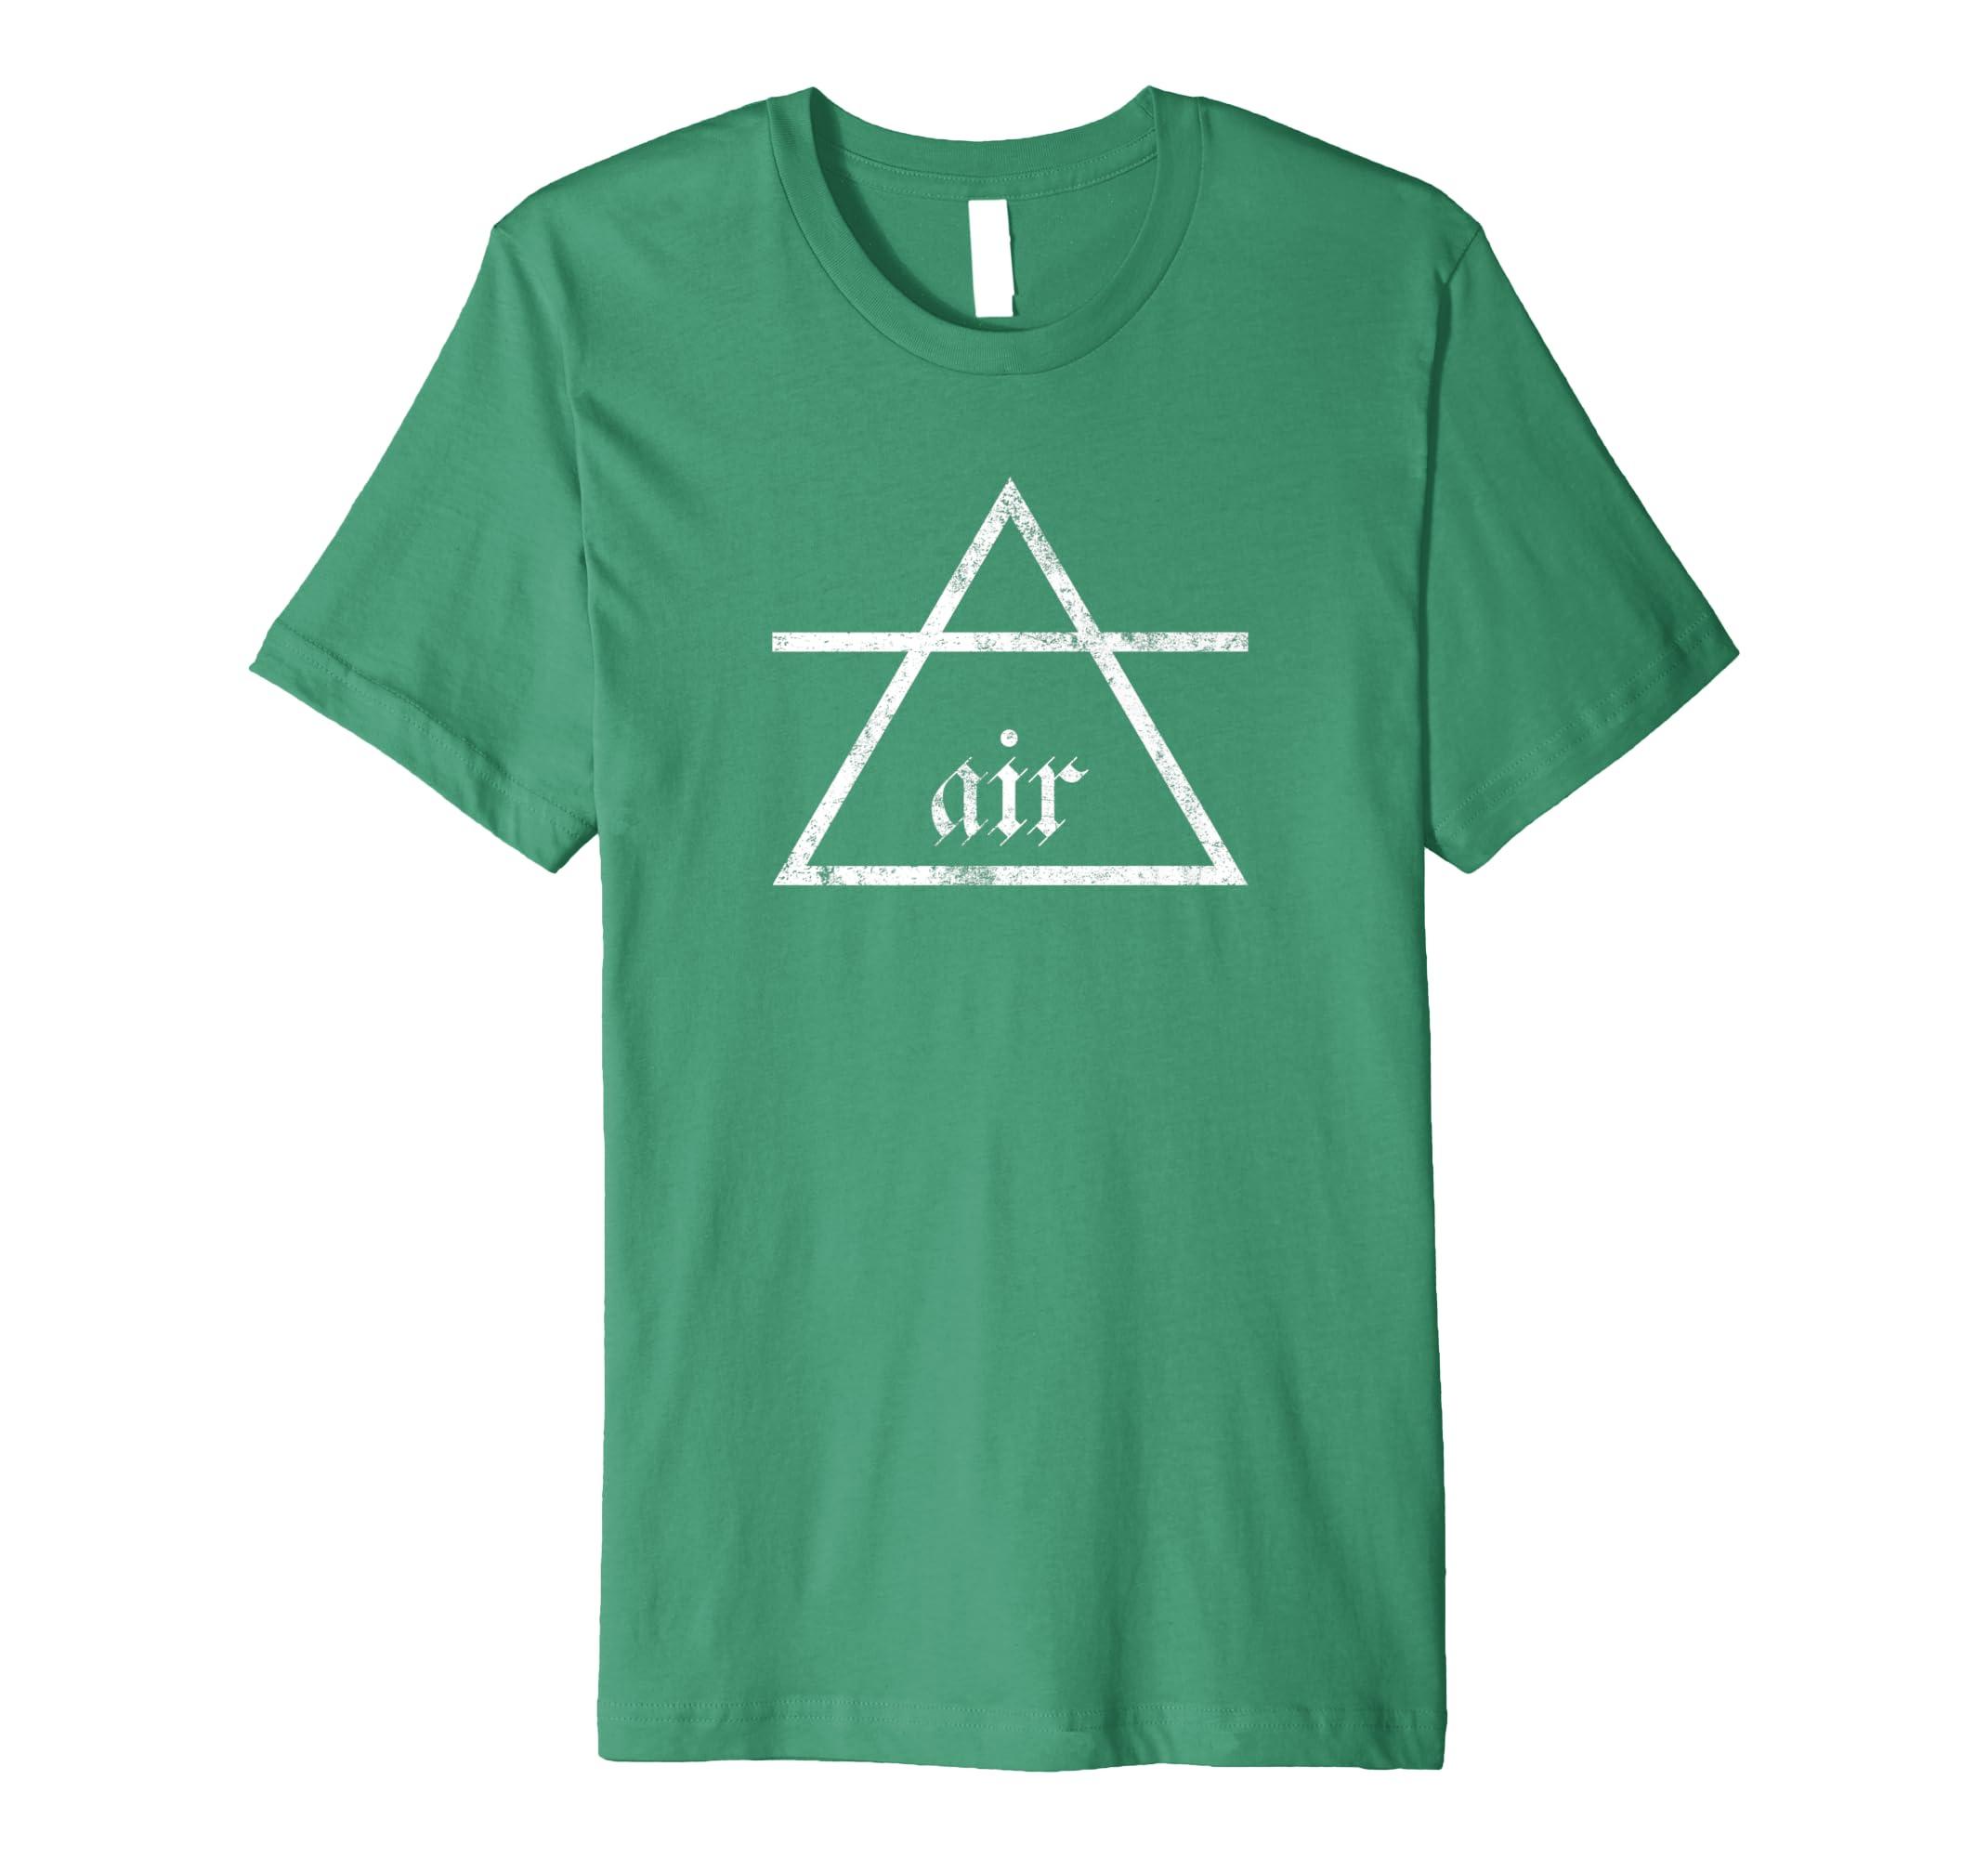 9102ce3fd5274 Amazon.com  Air Alchemy T-shirt Alchemical Classical Element Symbol   Clothing